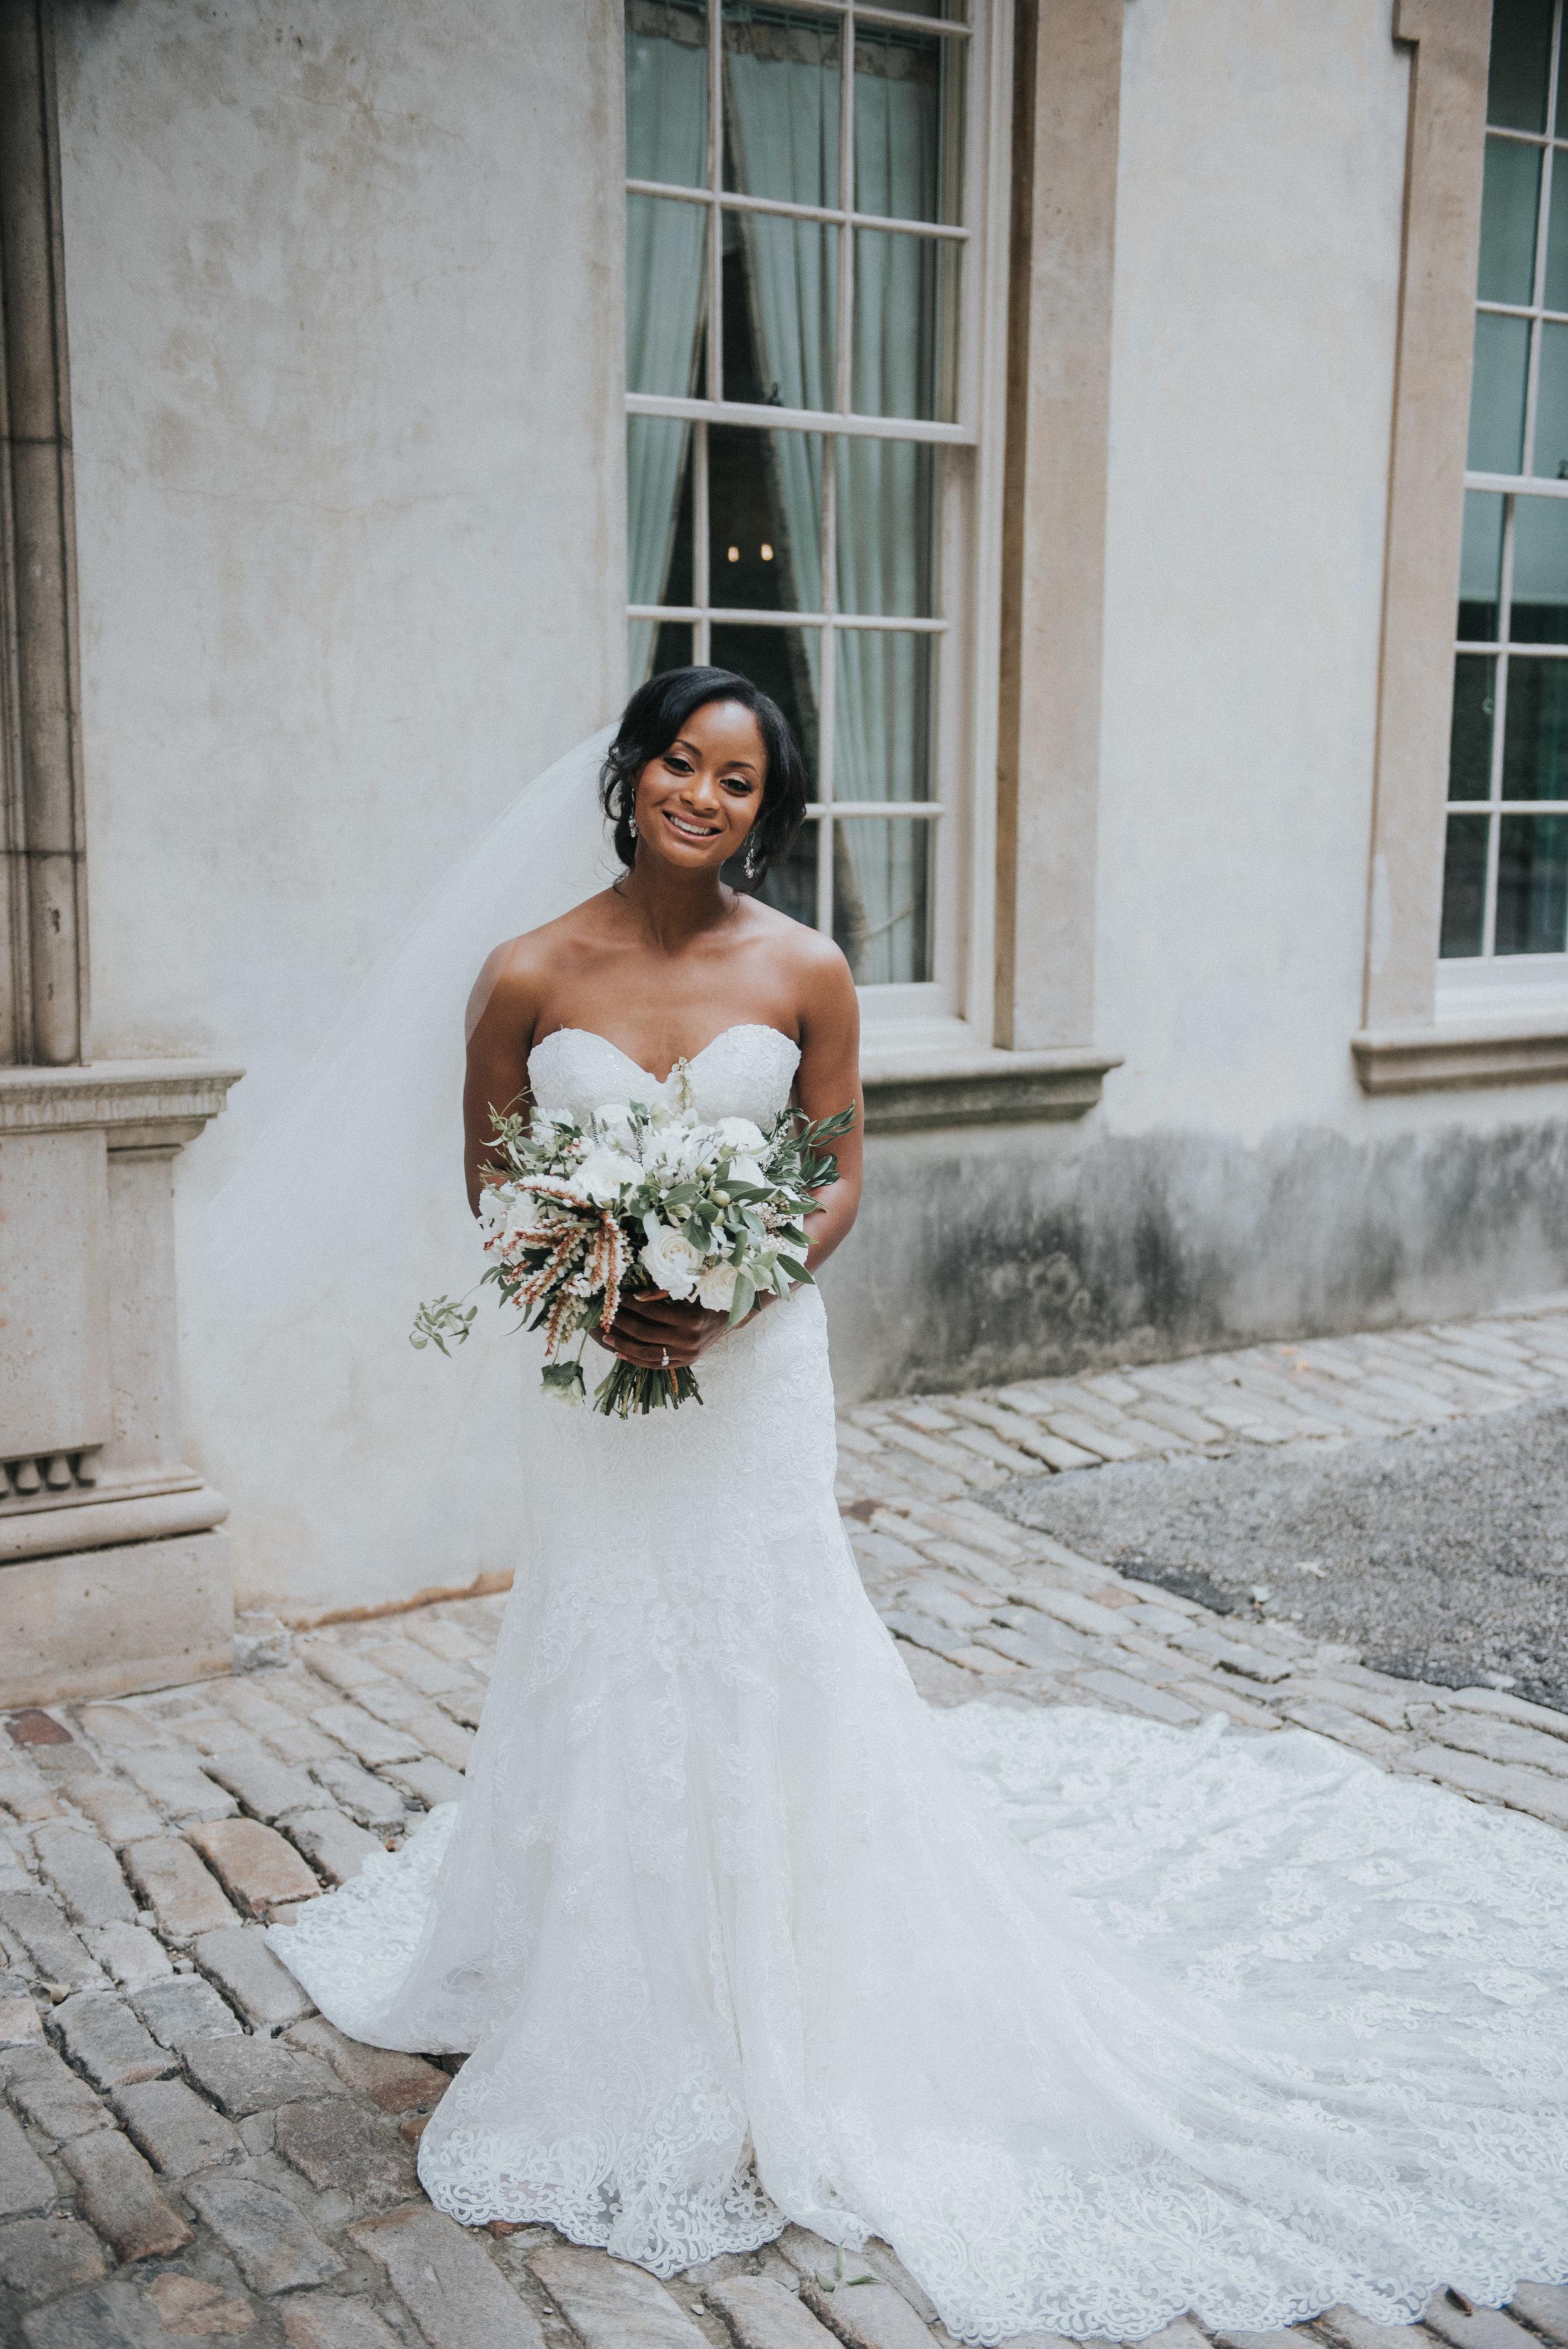 Bride in Martina Liana wedding gown